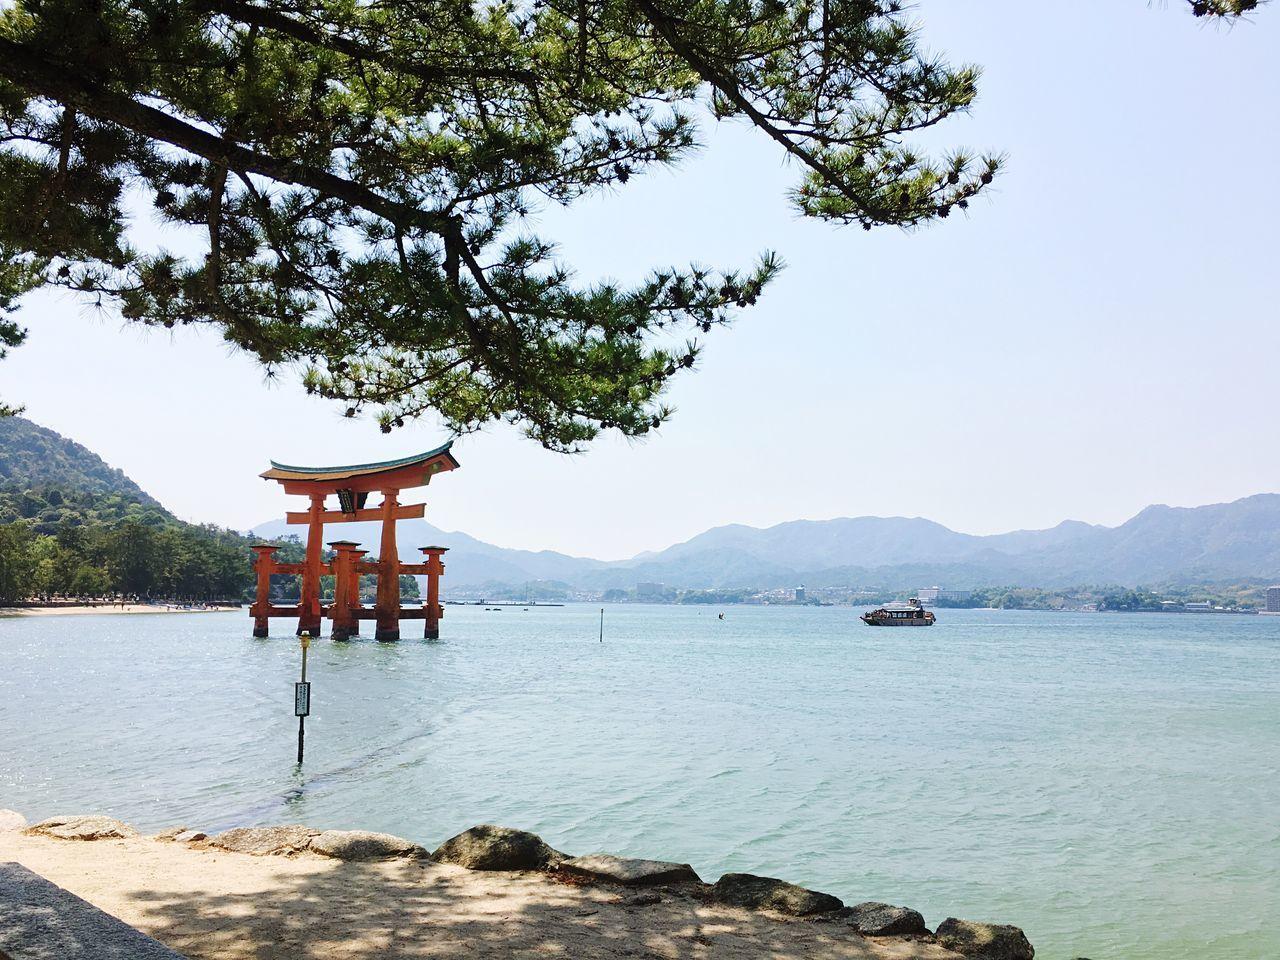 Water Nature Tree Sea And Sky Mode Of Transport Beauty In Nature Outdoors Tranquility Day Mountain Japanese Shrine Itsukushima Shrine Miyajima Miyajima Torii Hiroshima Travel Destinations